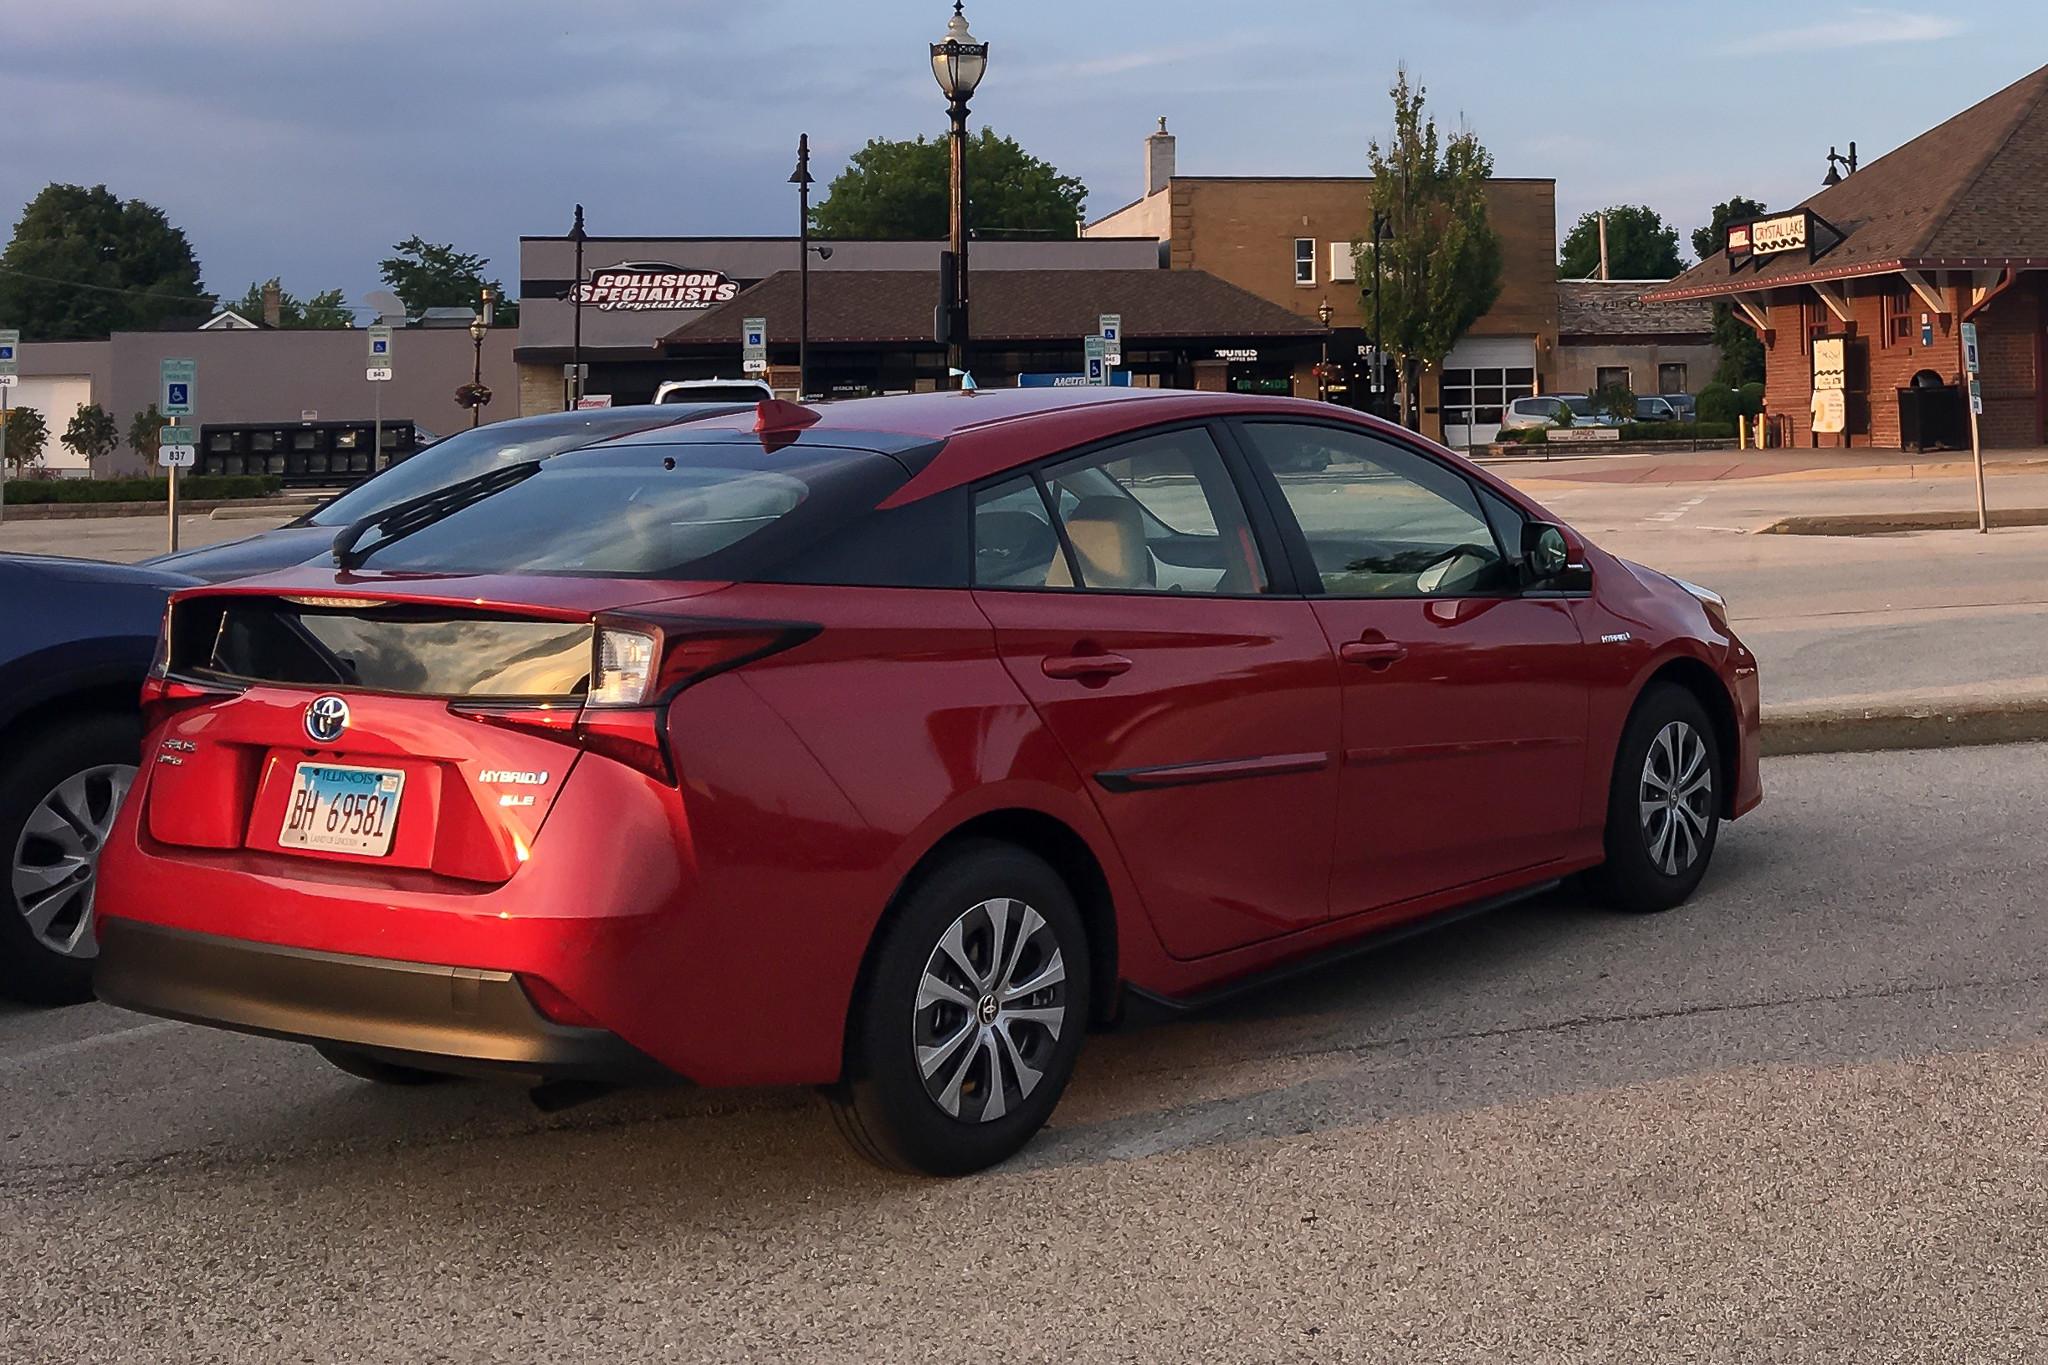 toyota-prius-awd-e-2019-01-angle--exterior--rear--red.jpg